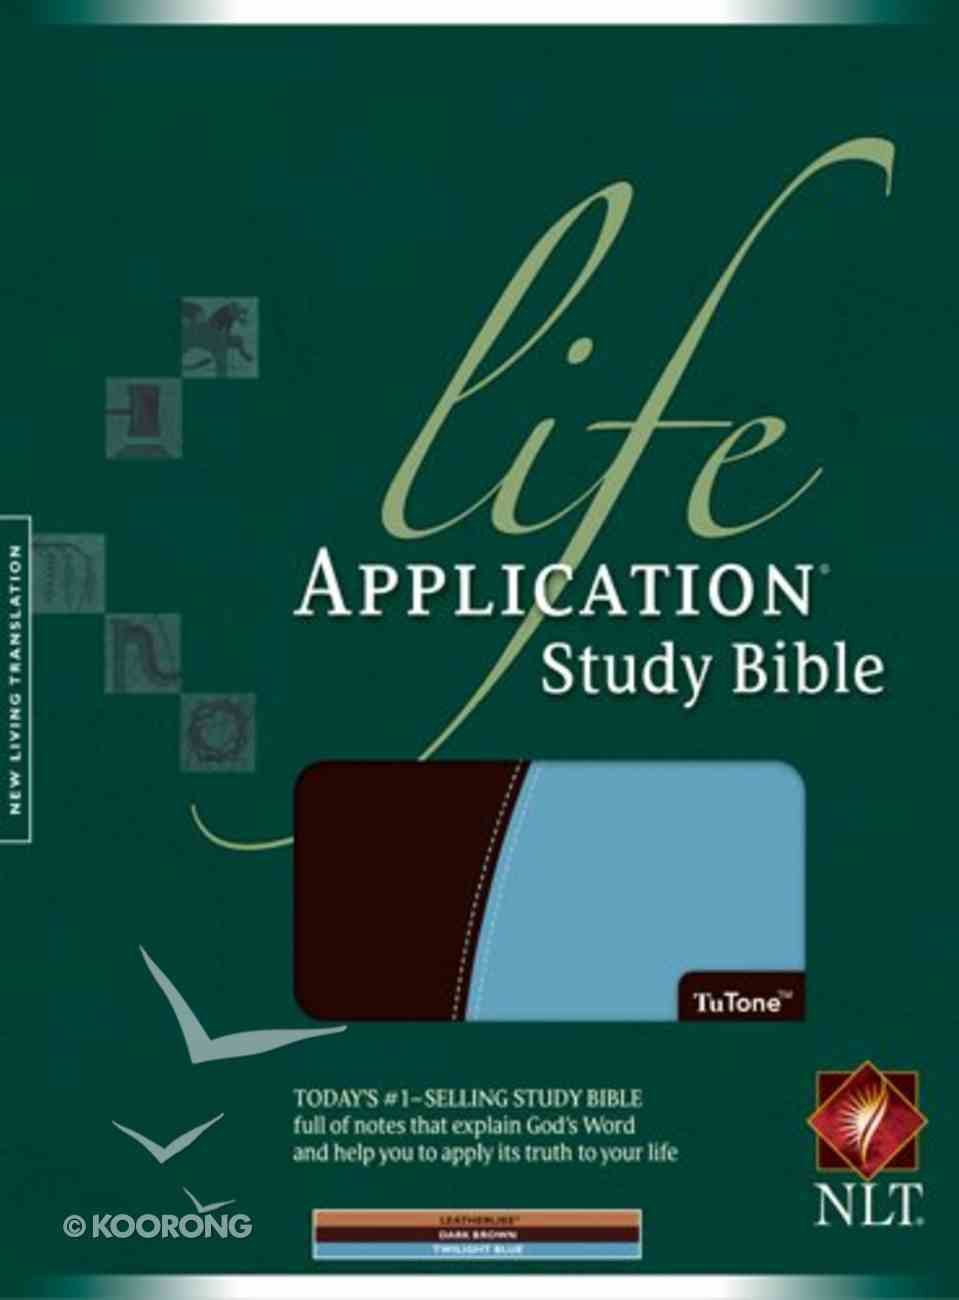 NLT Life Application Study Bible Dark Brown/Twilight Blue Imitation Leather